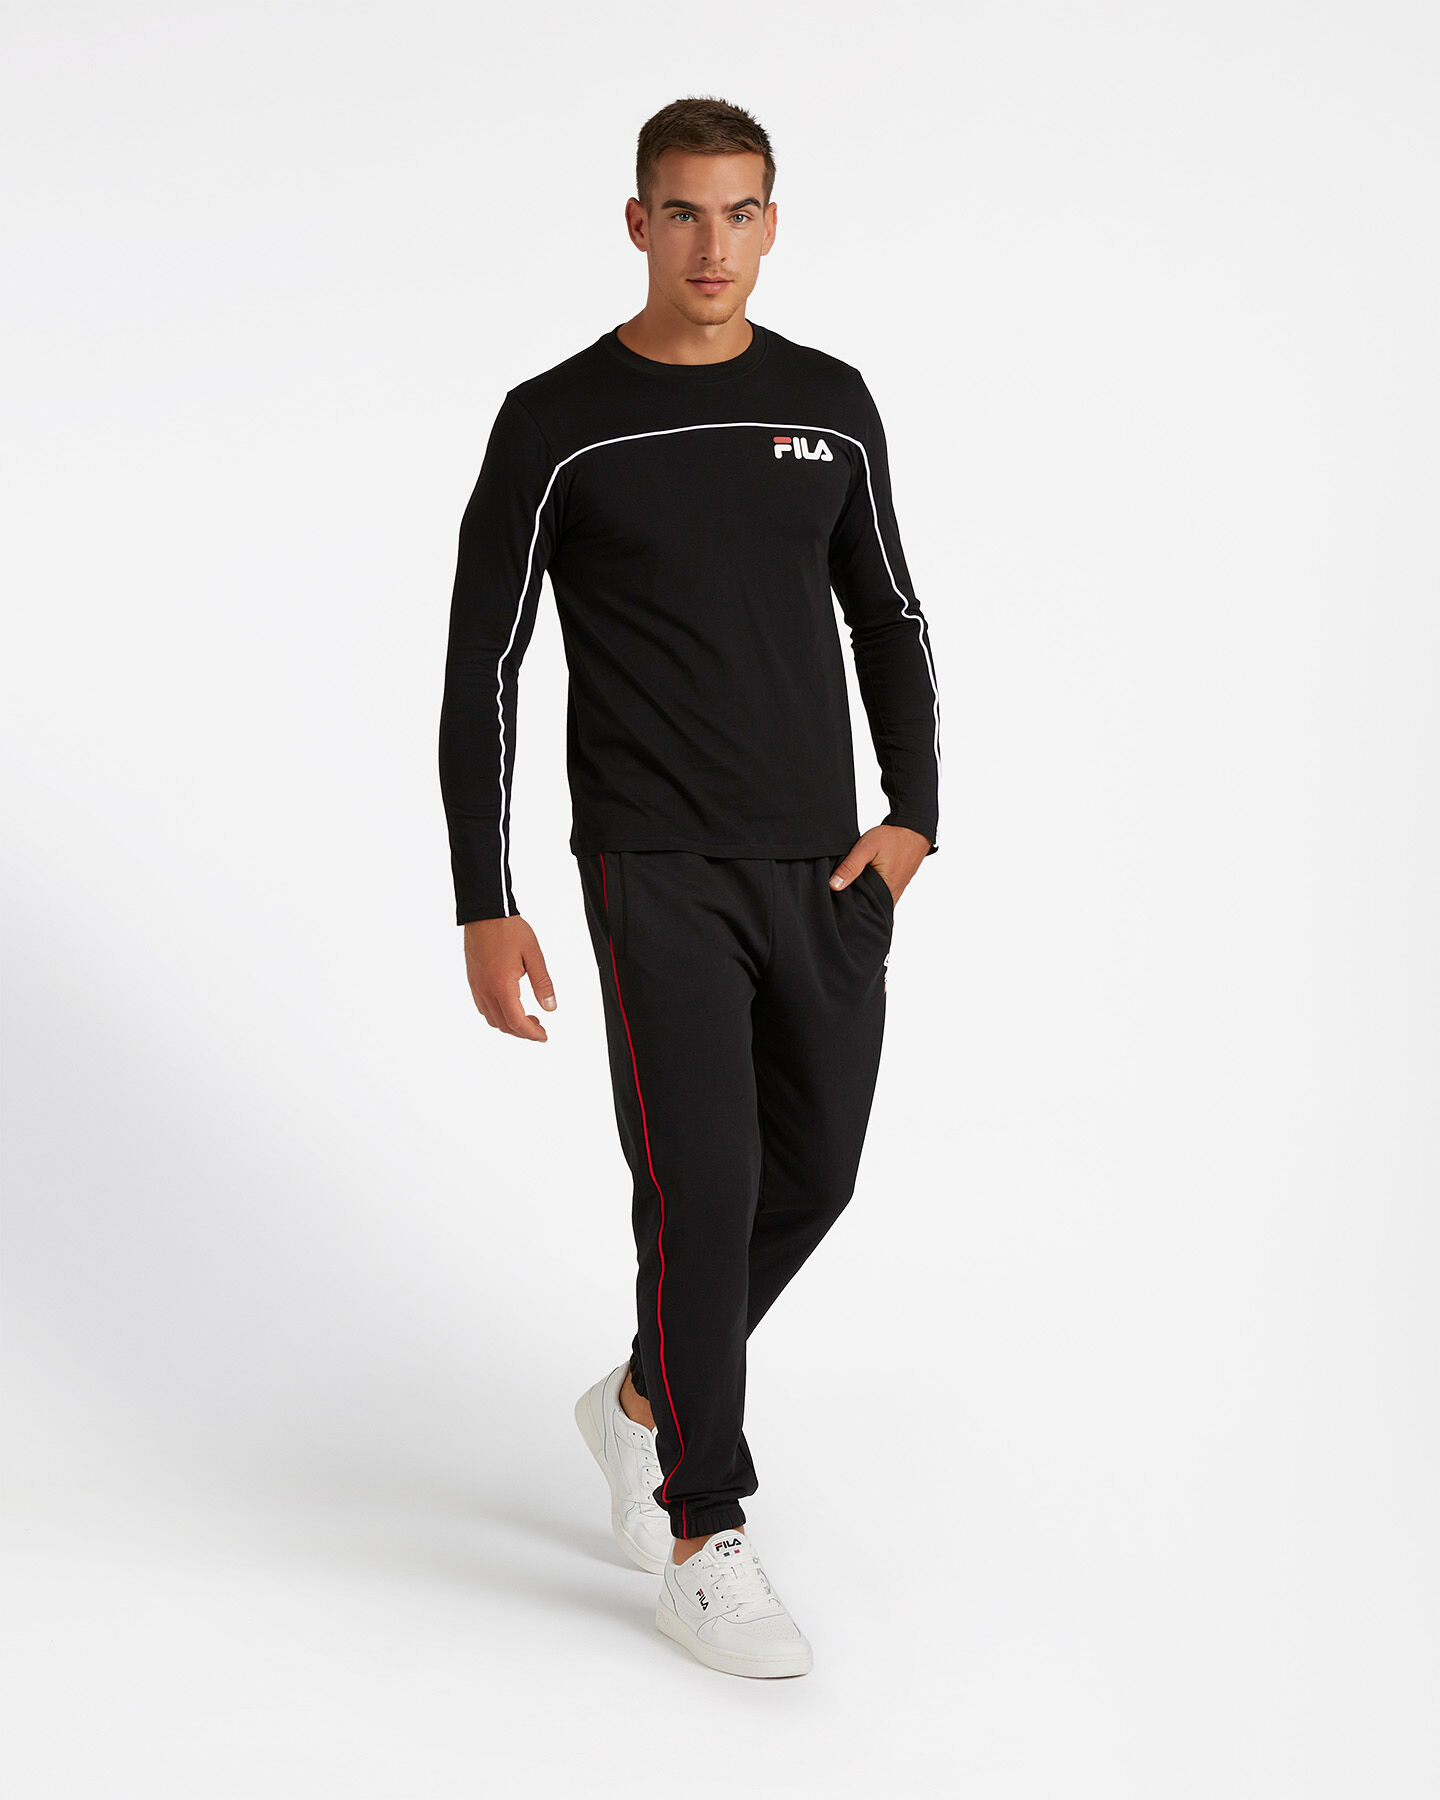 T-Shirt FILA LOGO M S4080475 scatto 3